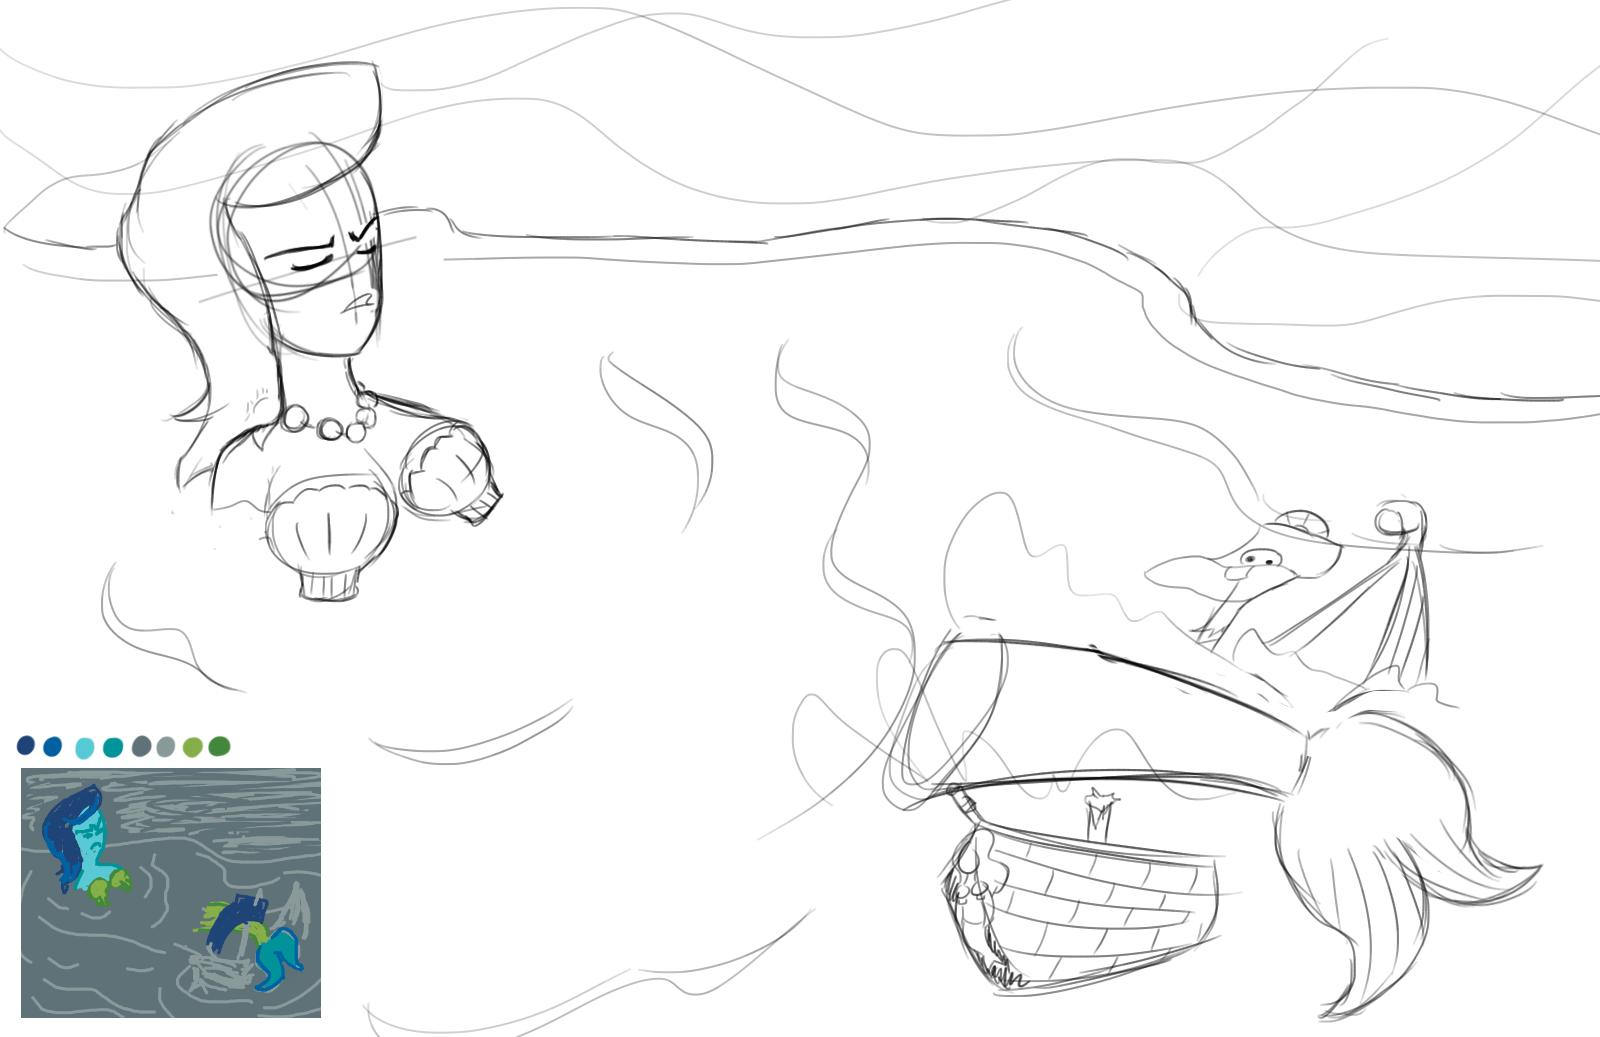 Sketch: Mermaid Sinks A Pirate Ship